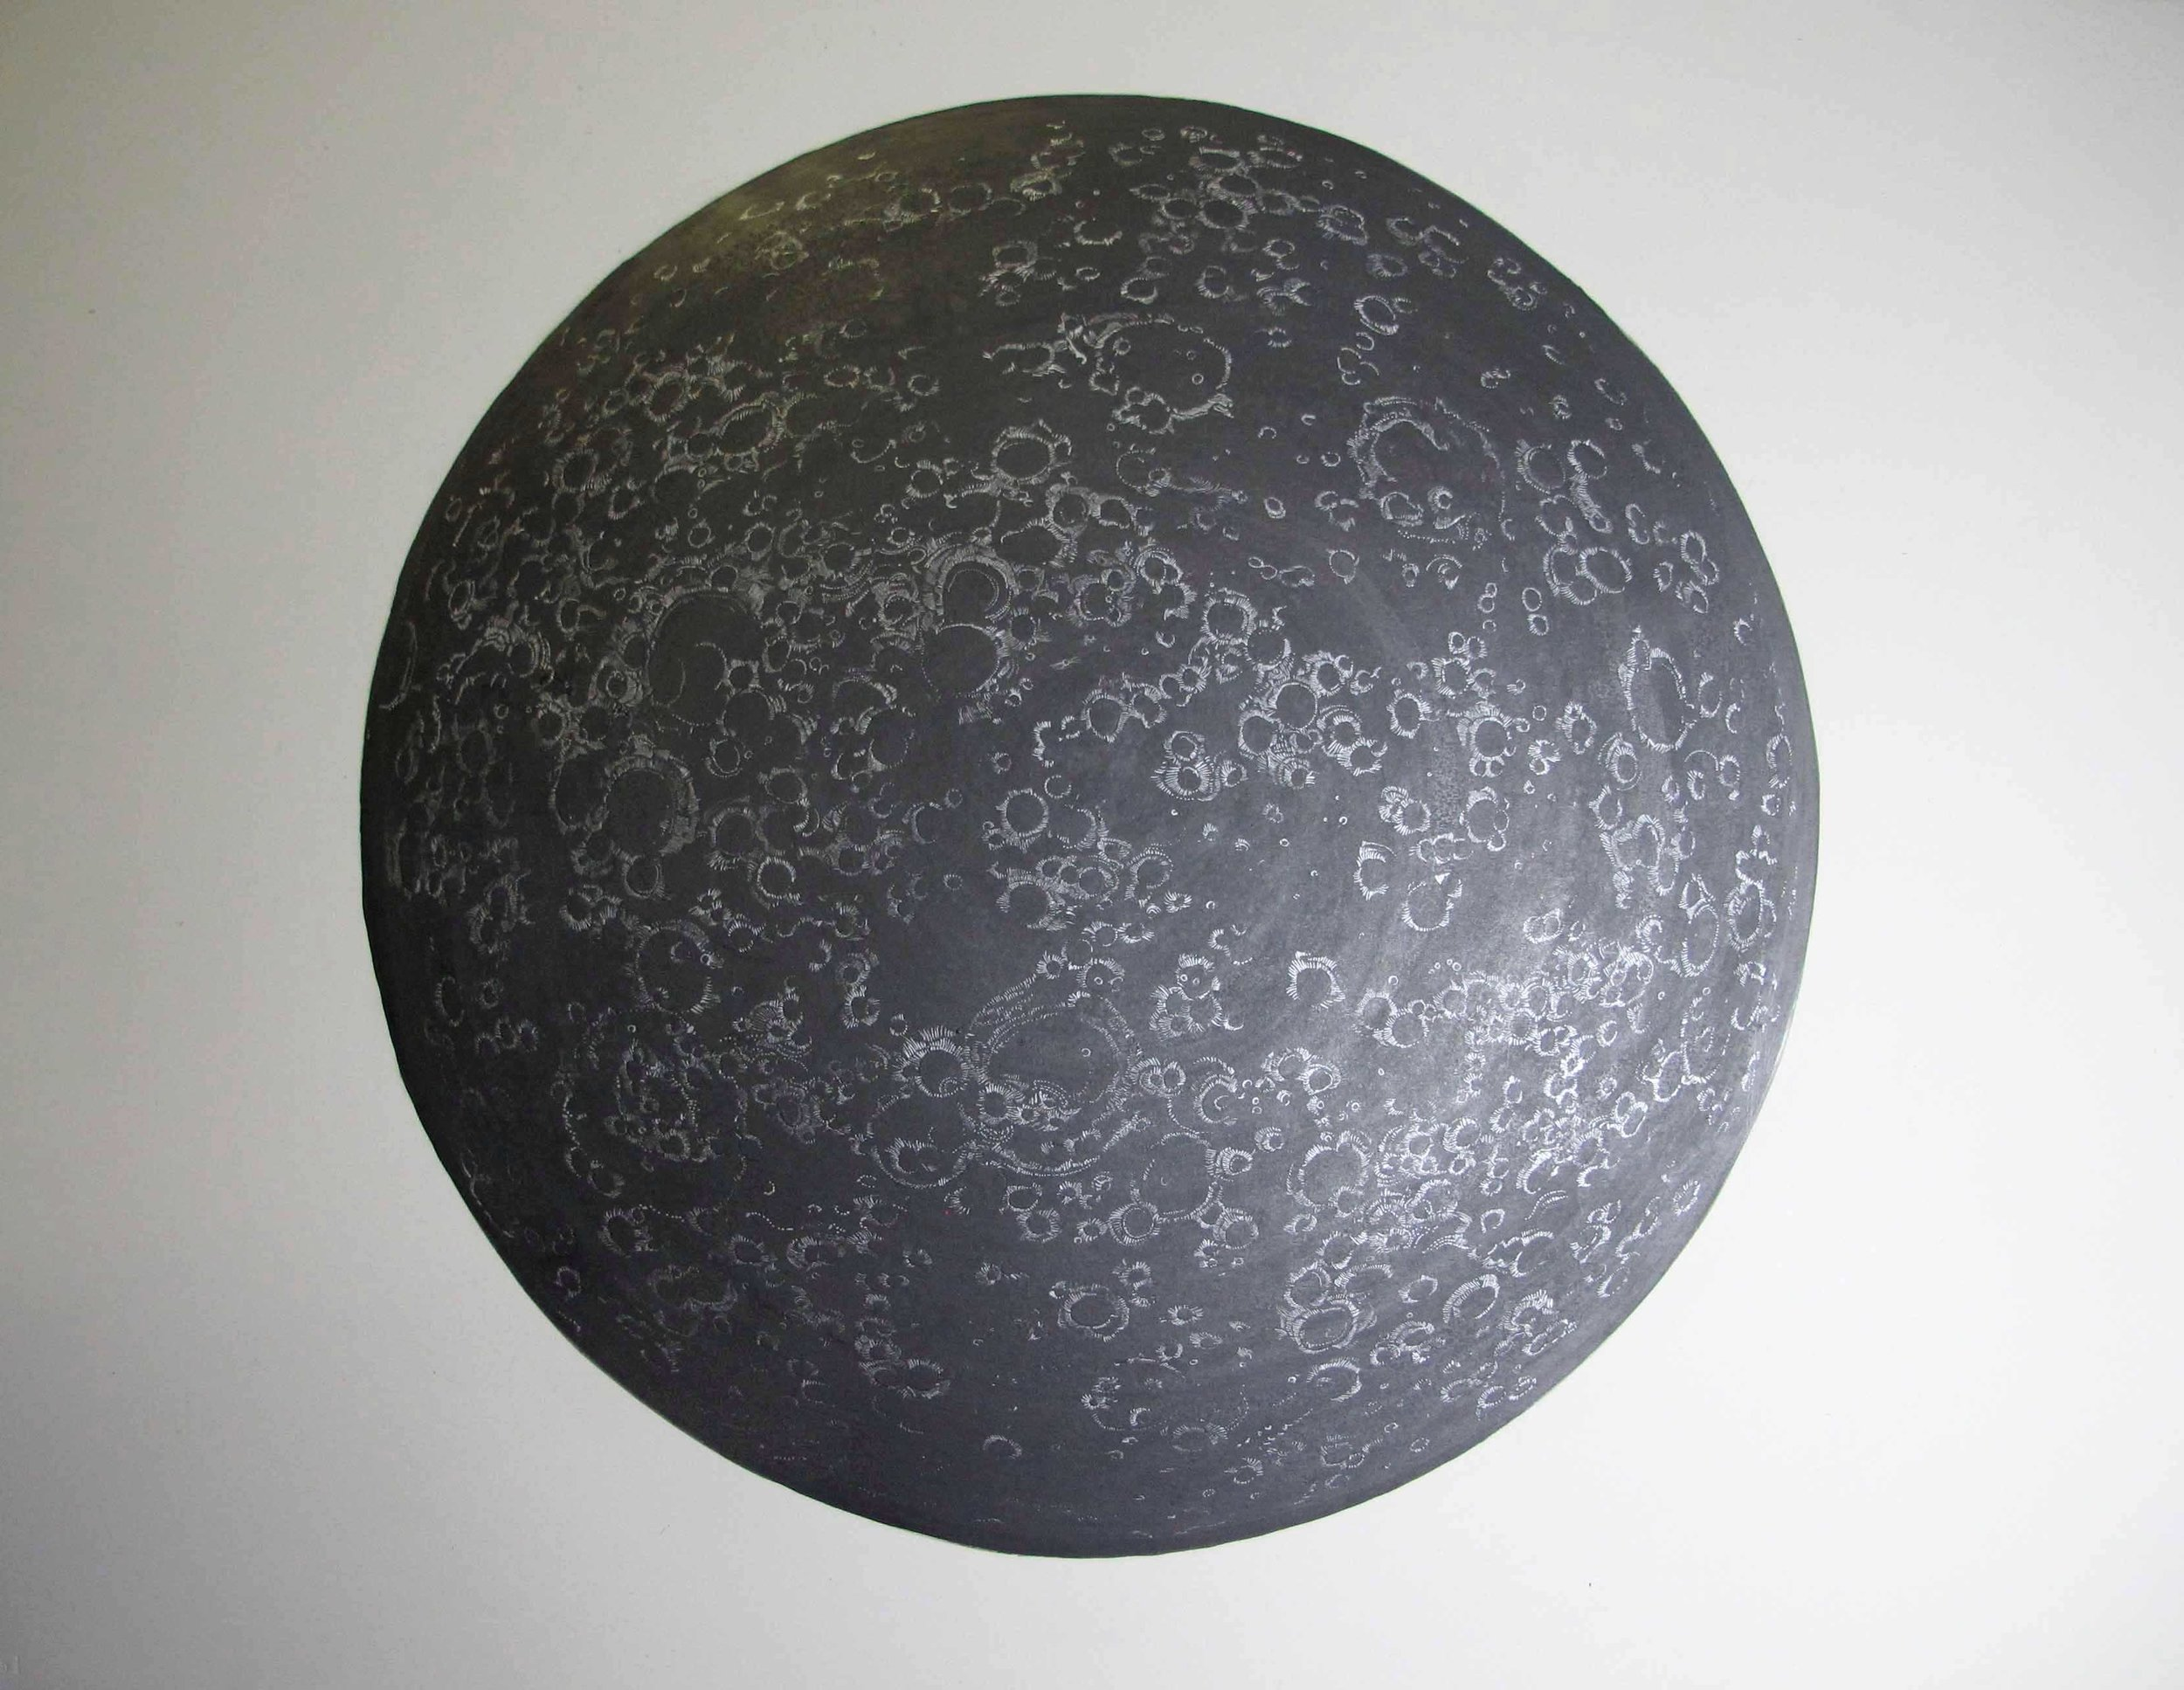 Simon MacEwan, The Sea of Dreams , 2012, graphite and silver ink on paper, 76 x 56cm